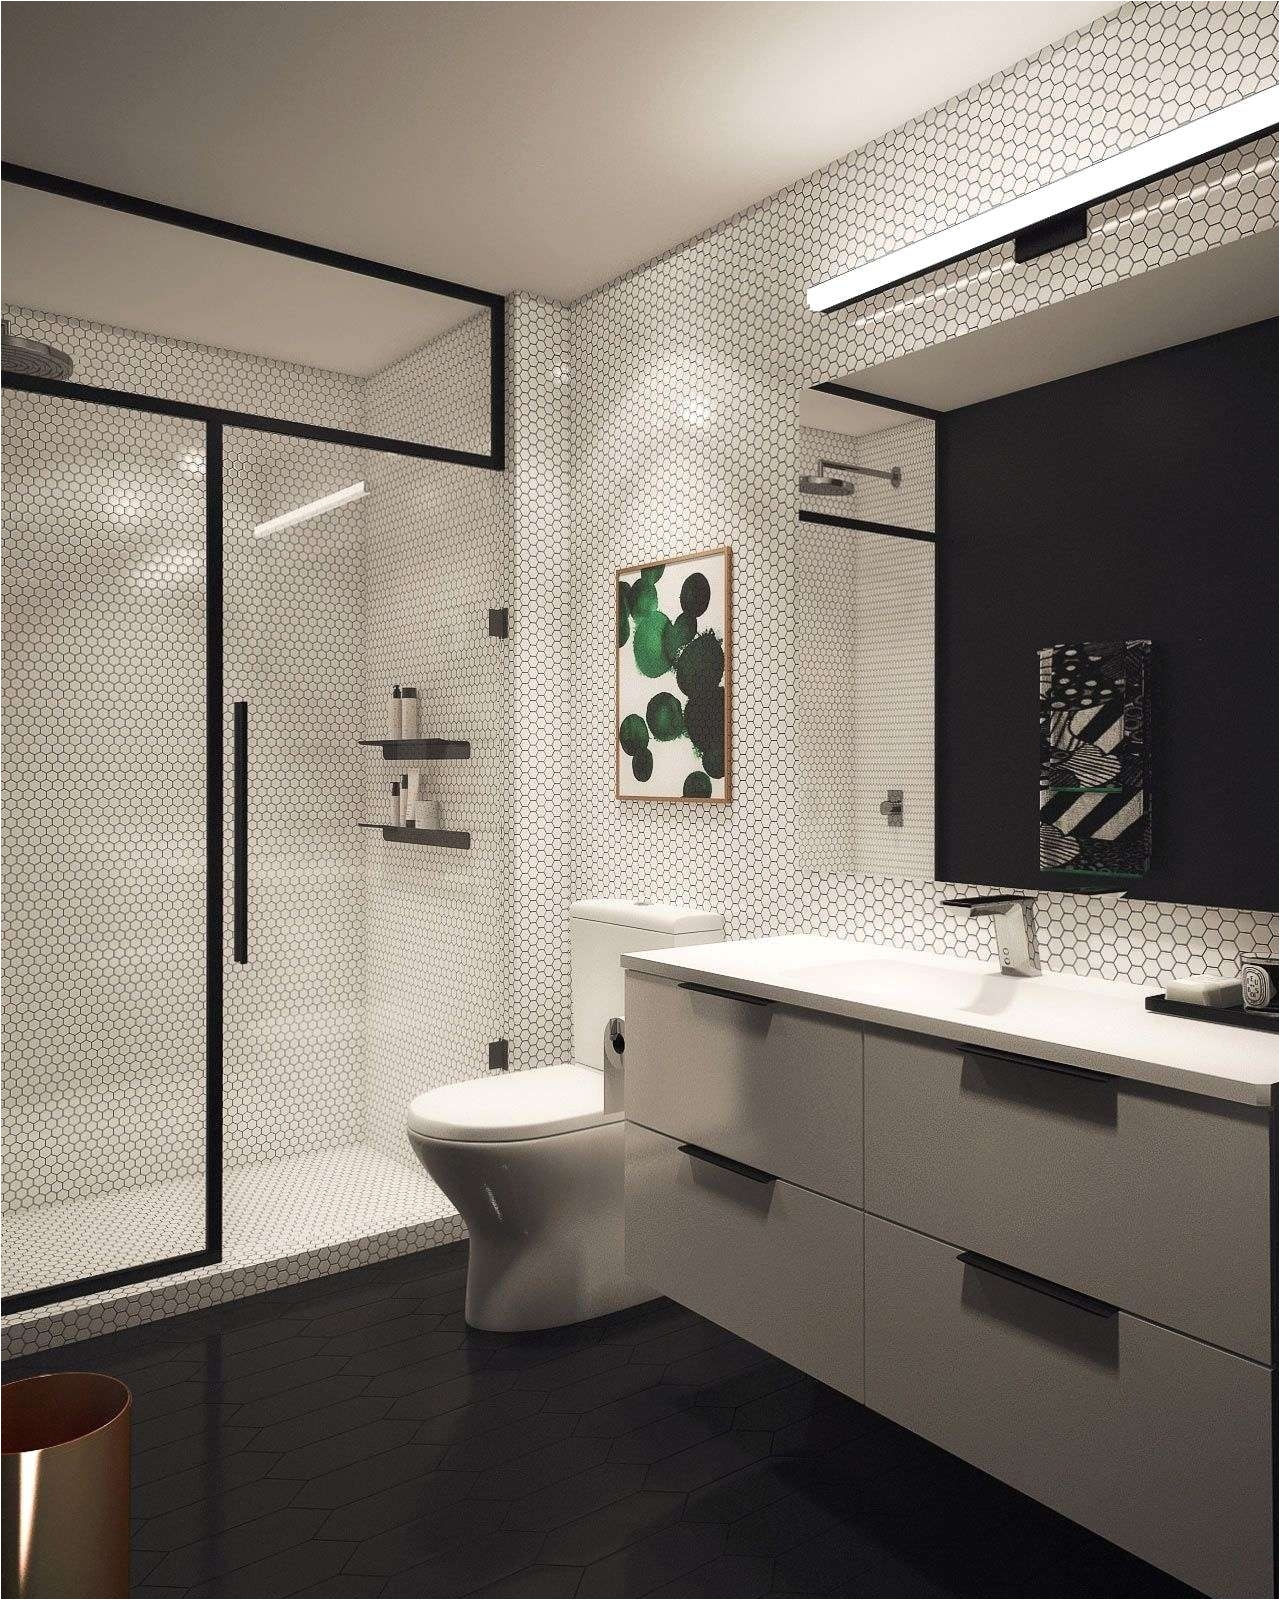 Bathroom Design Ideas For Small Bathrooms Valid Lovely Small Bathroom Lighting Fresh Tag Toilet Ideas 0d Best Design